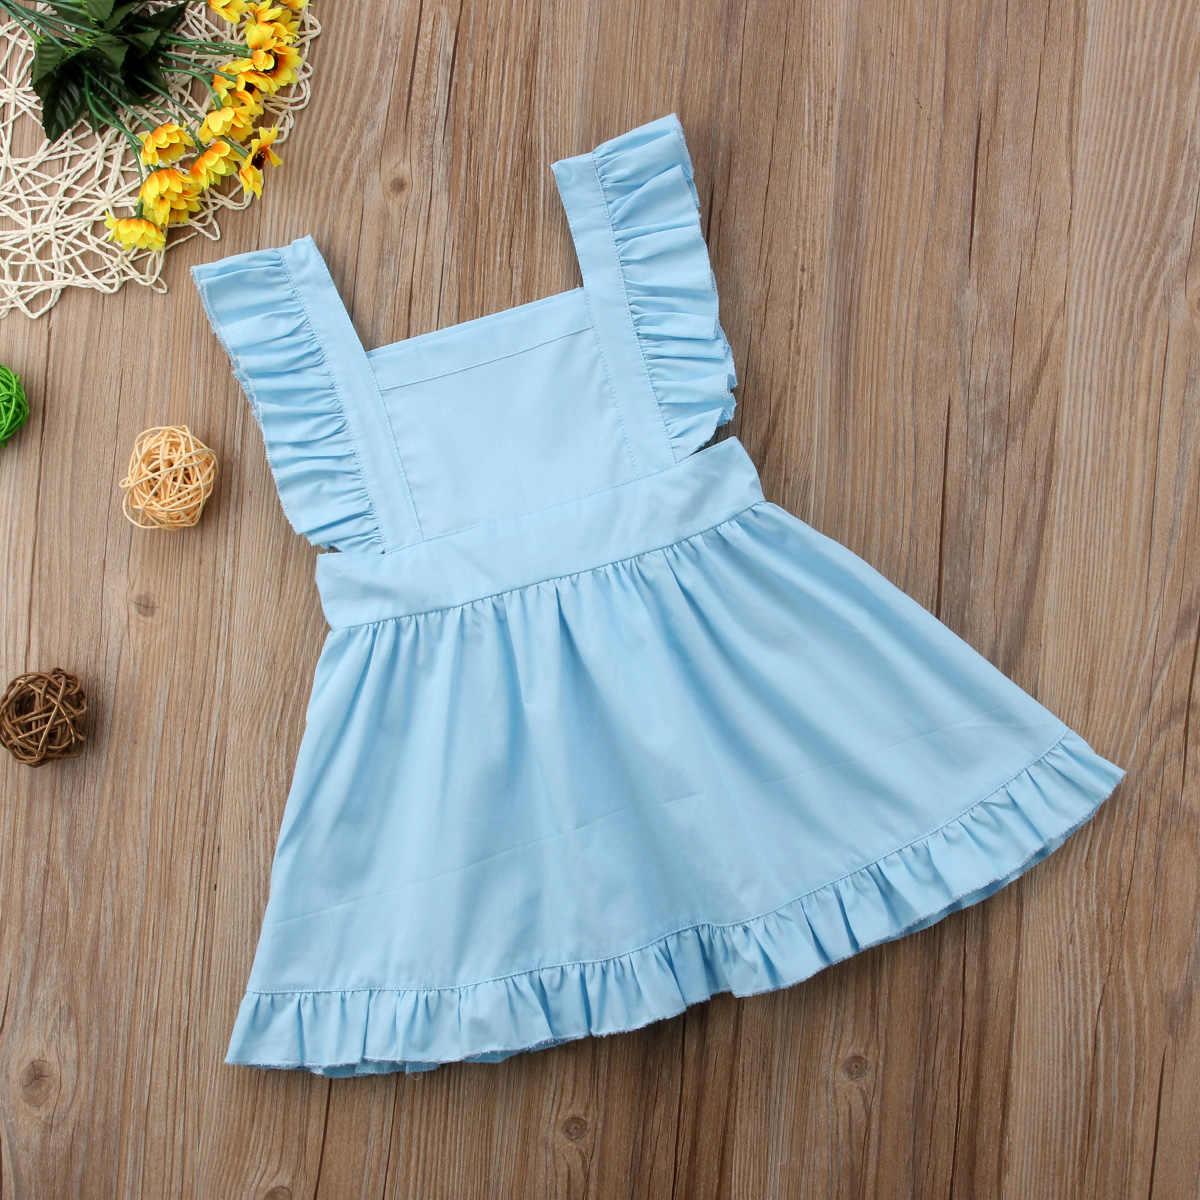 7496e51ea49 ... 0-5Y Newborn Infant Kids Baby Girl Summer Blue Tutu Dress Princess Party  Wedding Bowknot ...